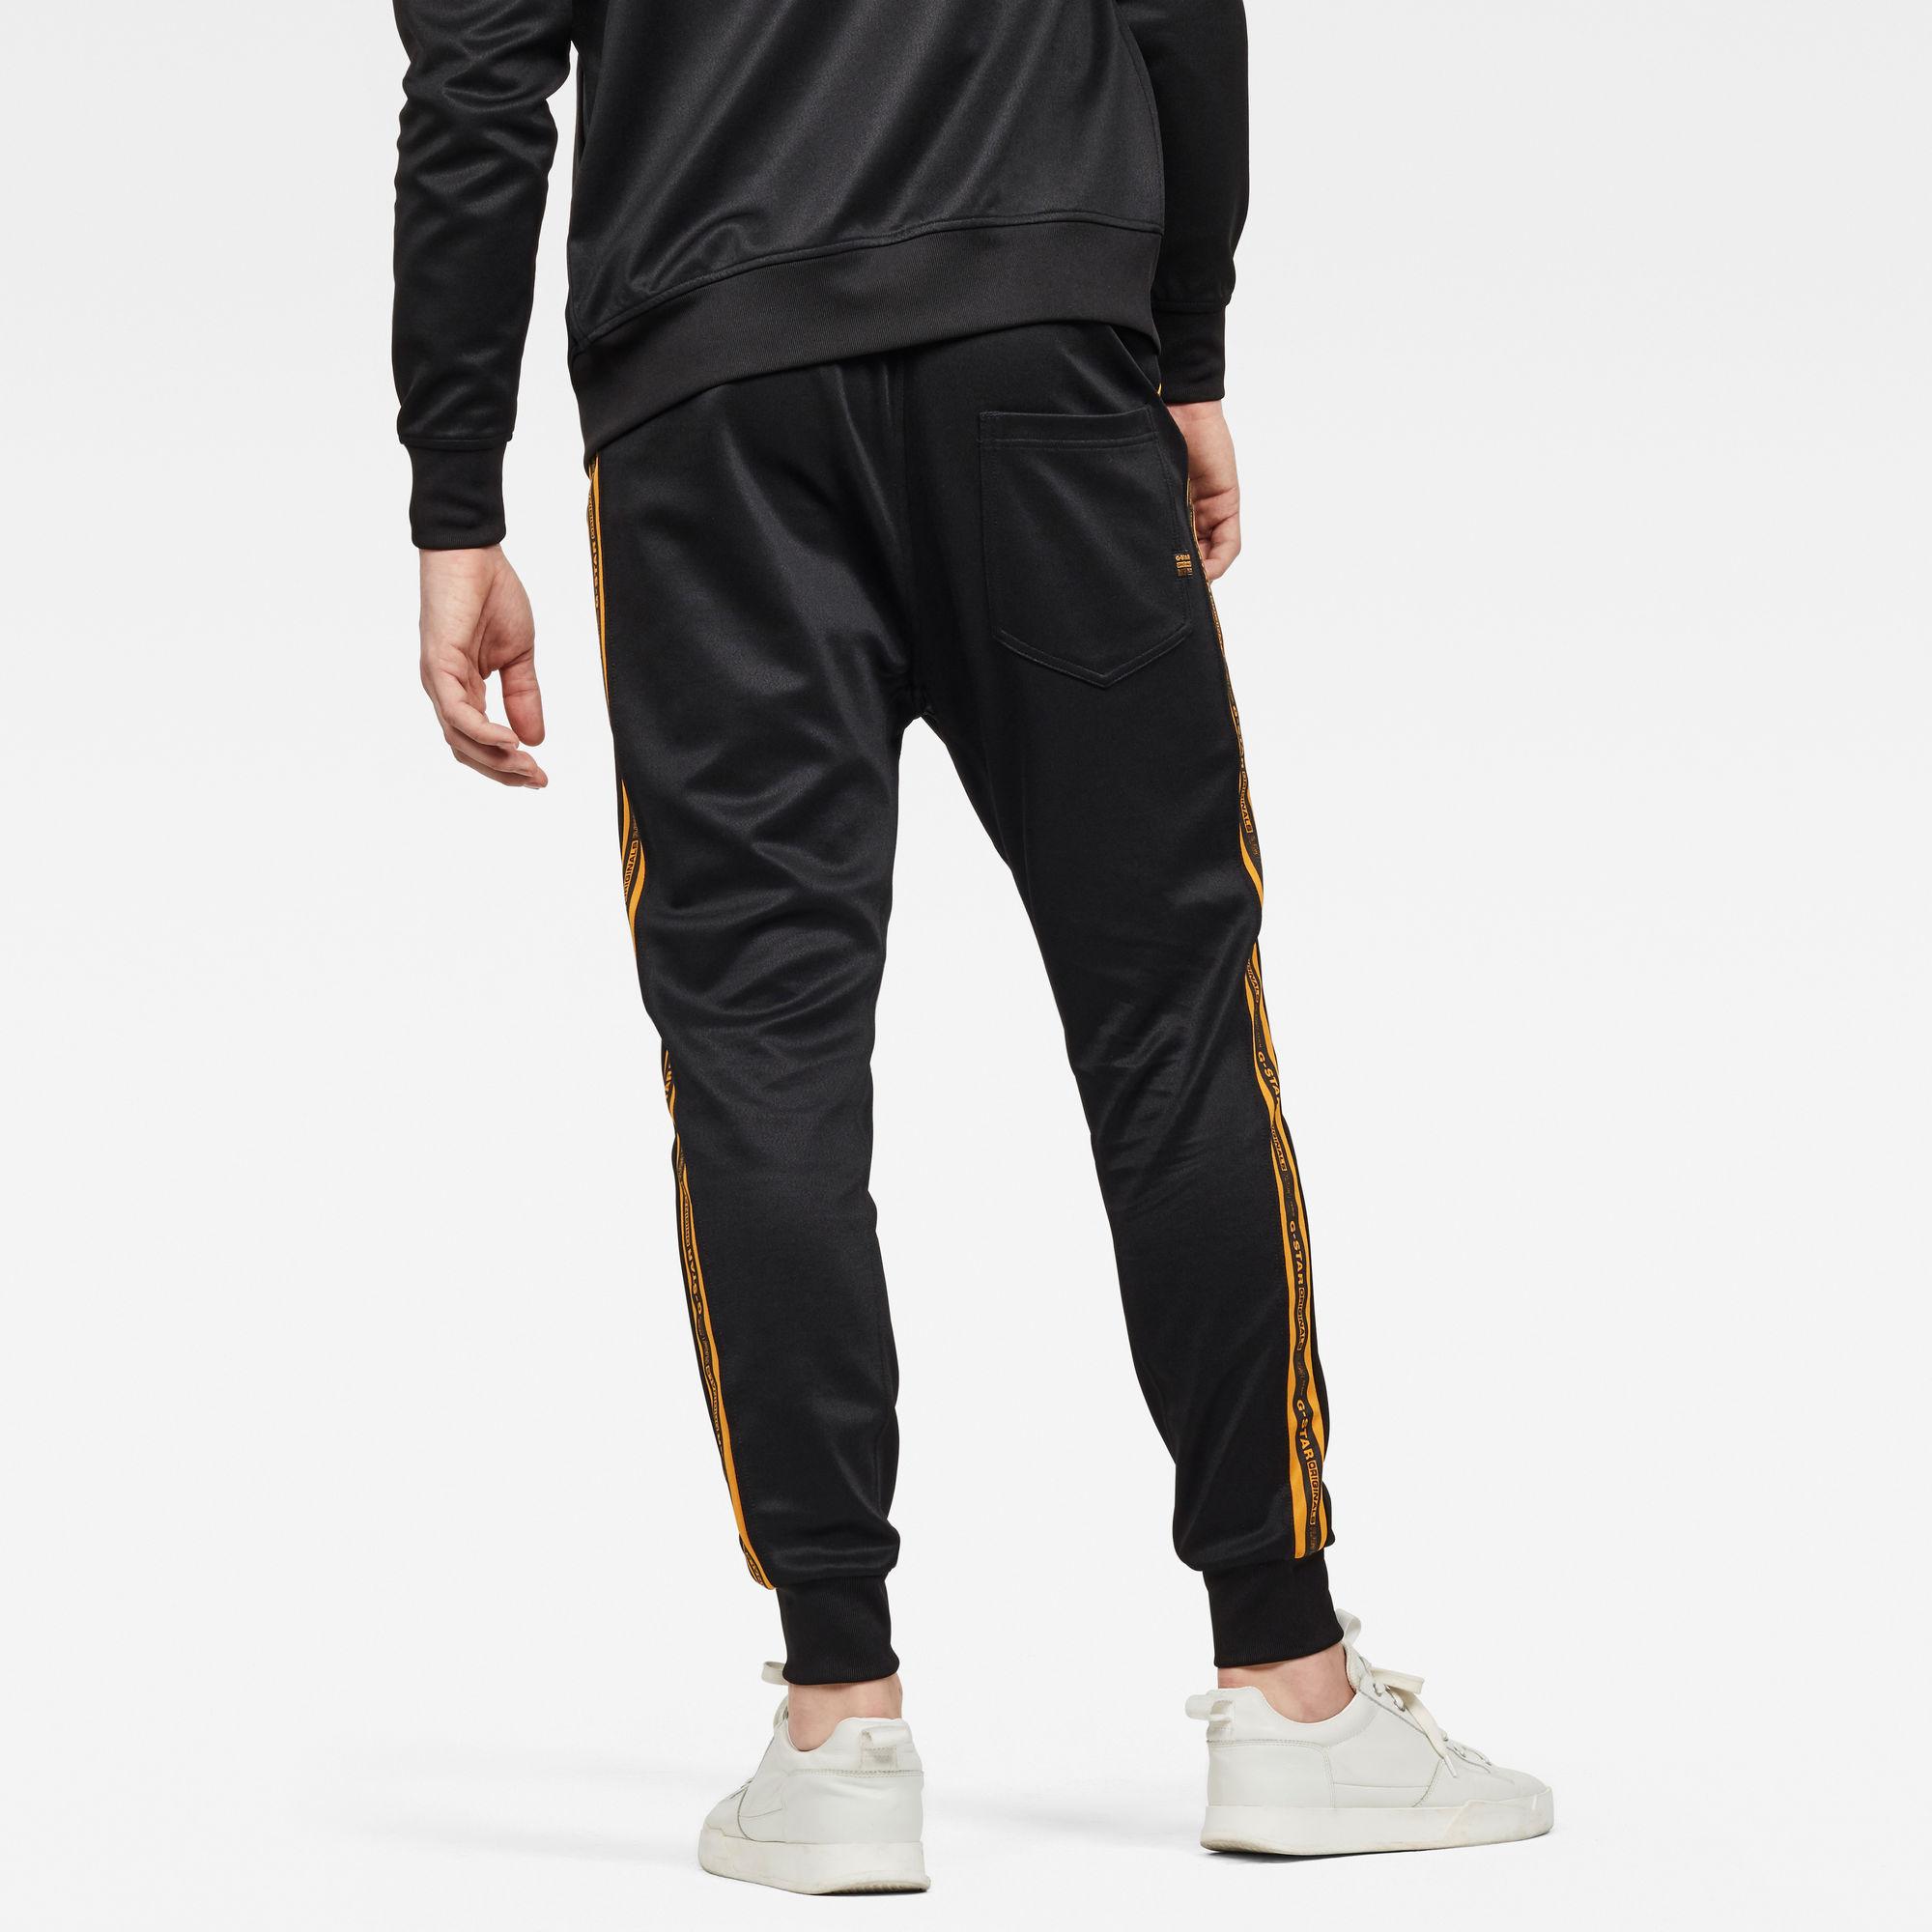 G-Star RAW Alchesai Slim Tapered Sweatpants